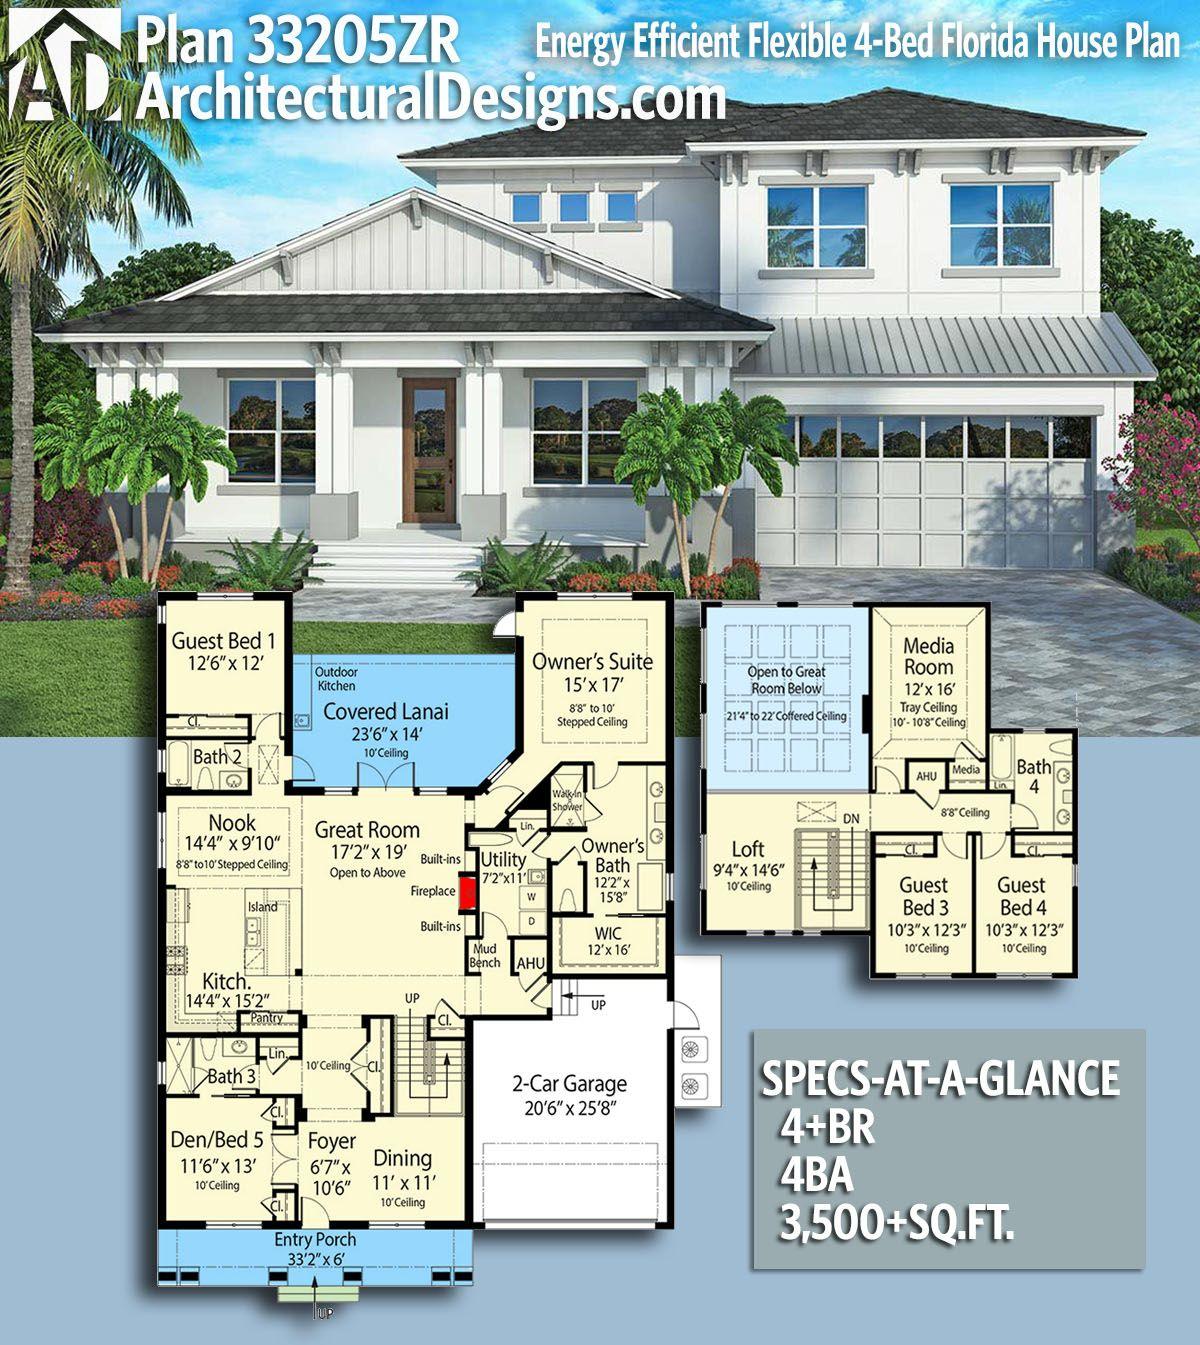 Plan 33205zr Energy Efficient 4 Bed Flexible Florida House Plan Florida House Plans House Plans Florida Home